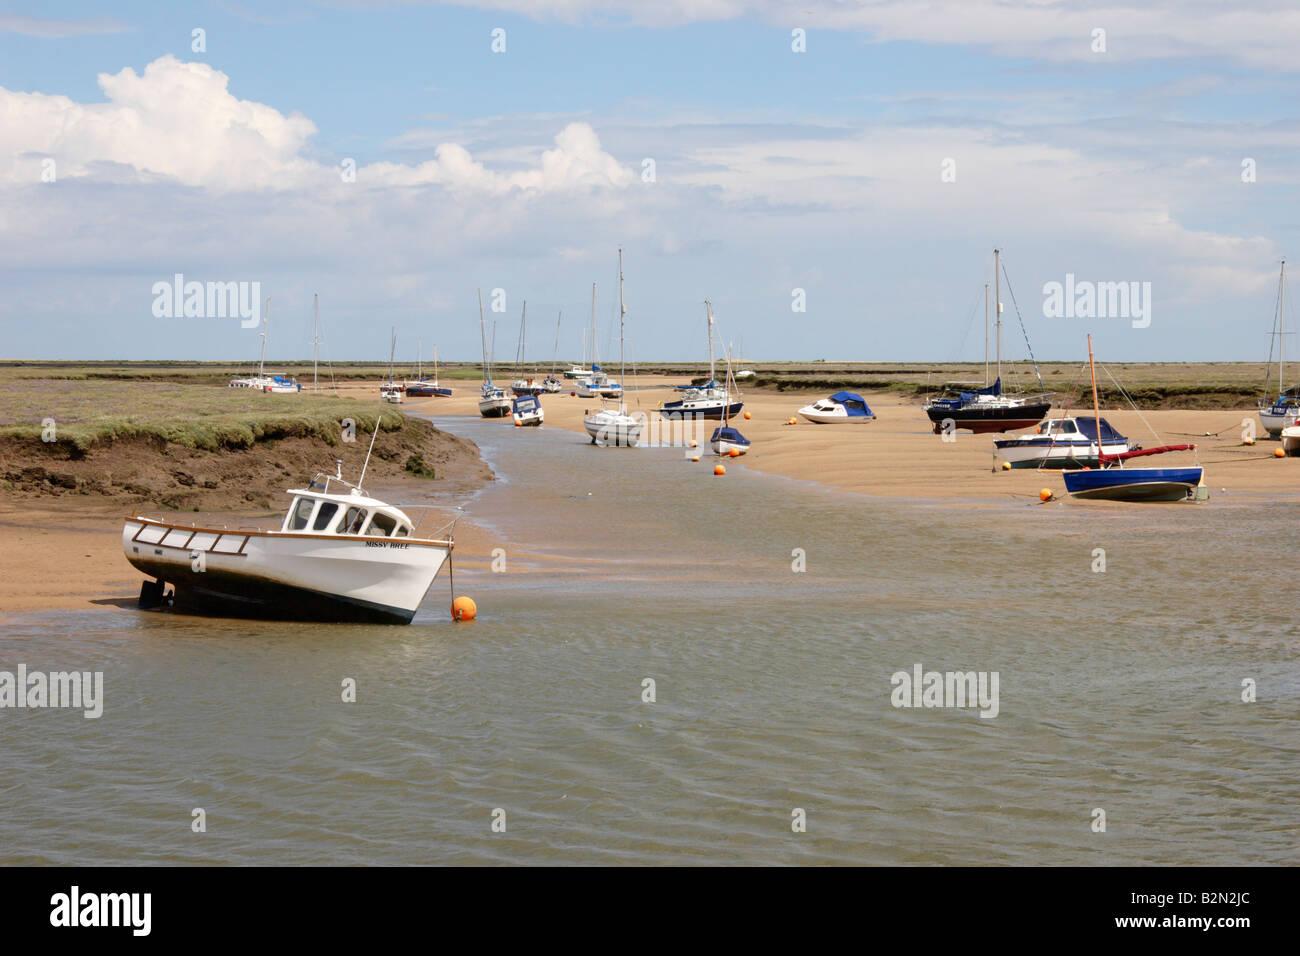 Wells Next the Sea, Saltmarshes, Norfolk, England. Stock Photo